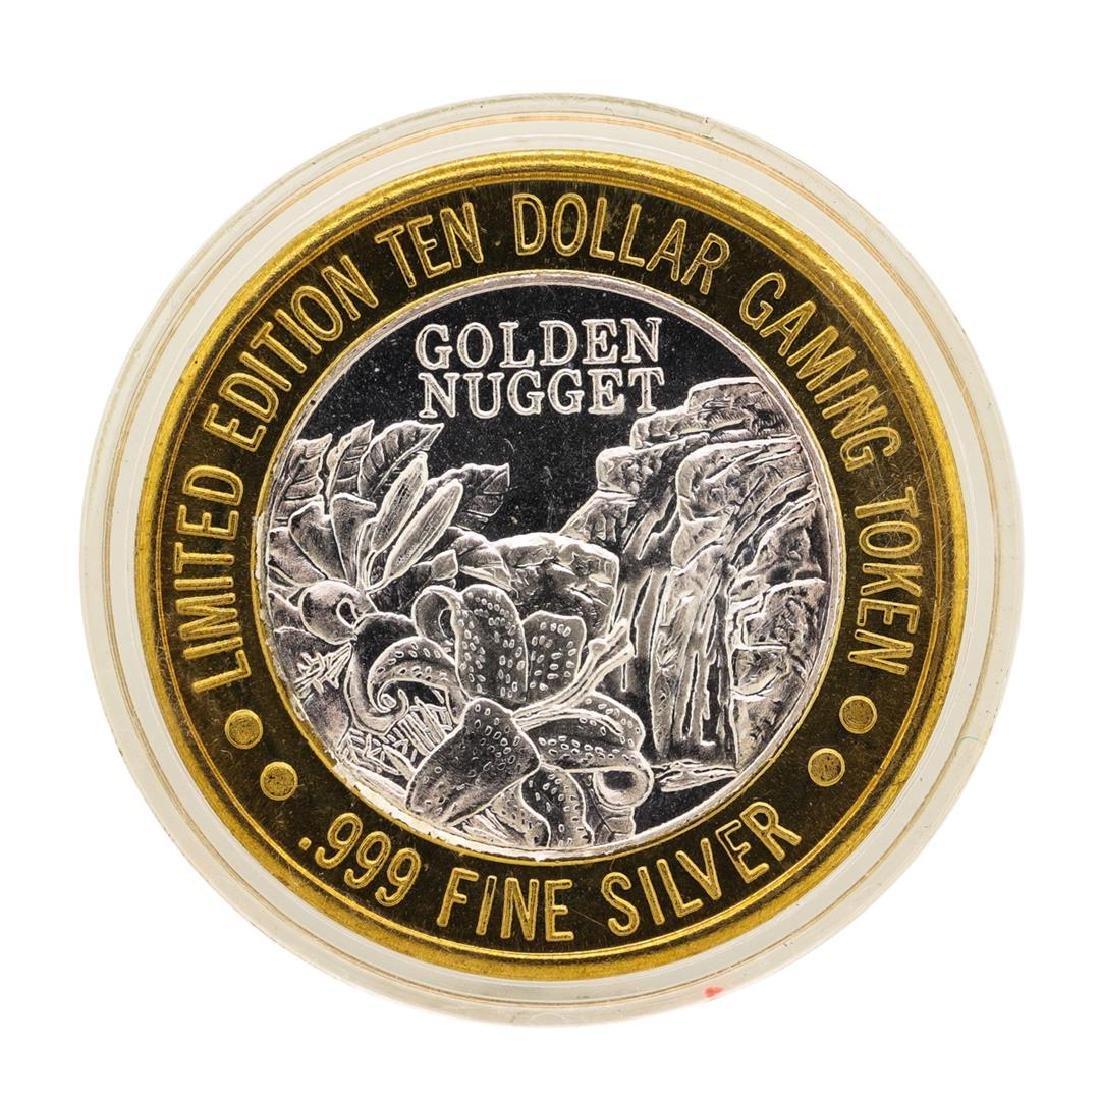 .999 Fine Silver Golden Nugget Las Vegas $10 Casino